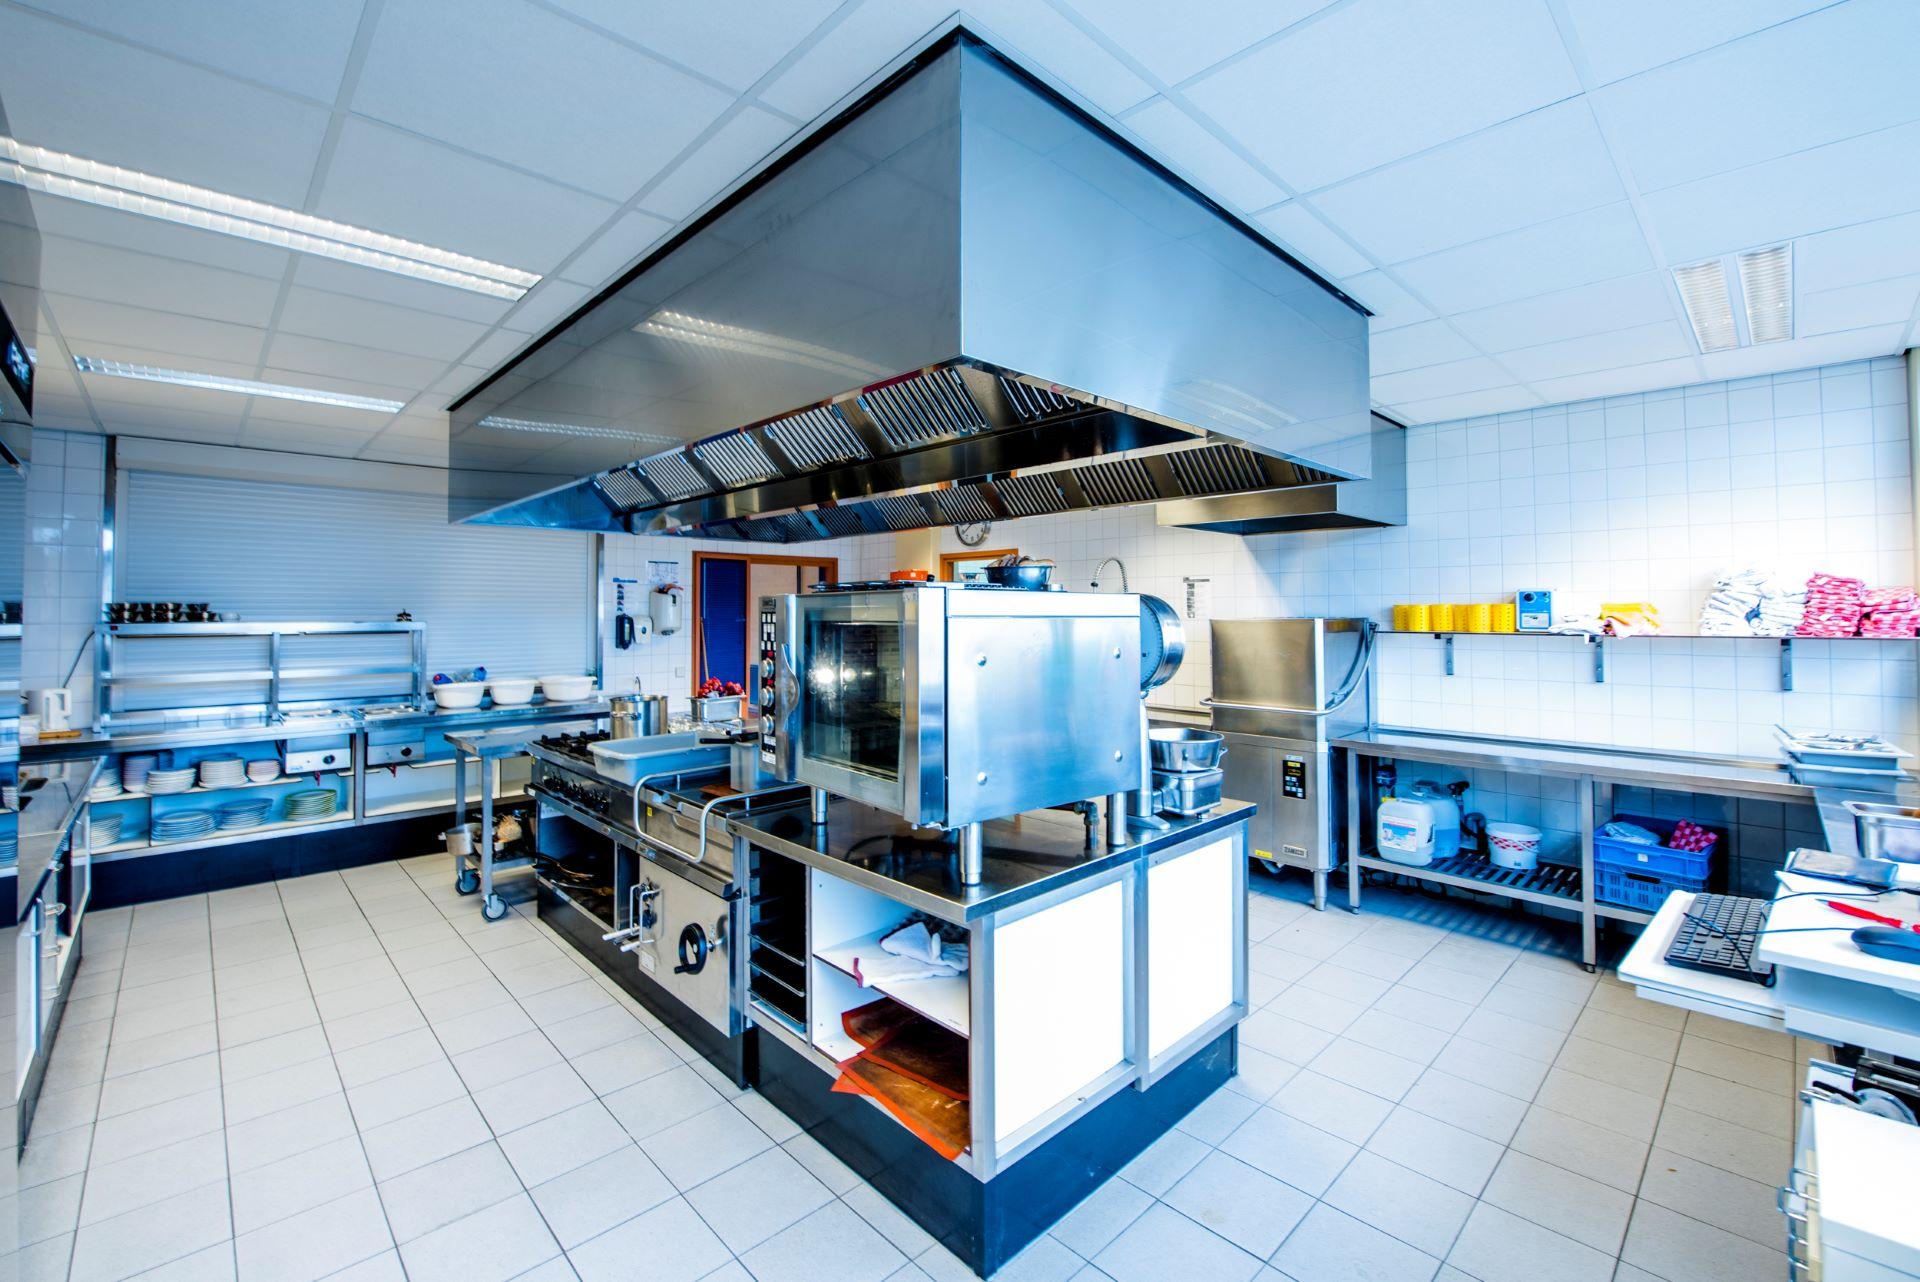 Praktijkruimte keuken op Praktijkschool Helmond